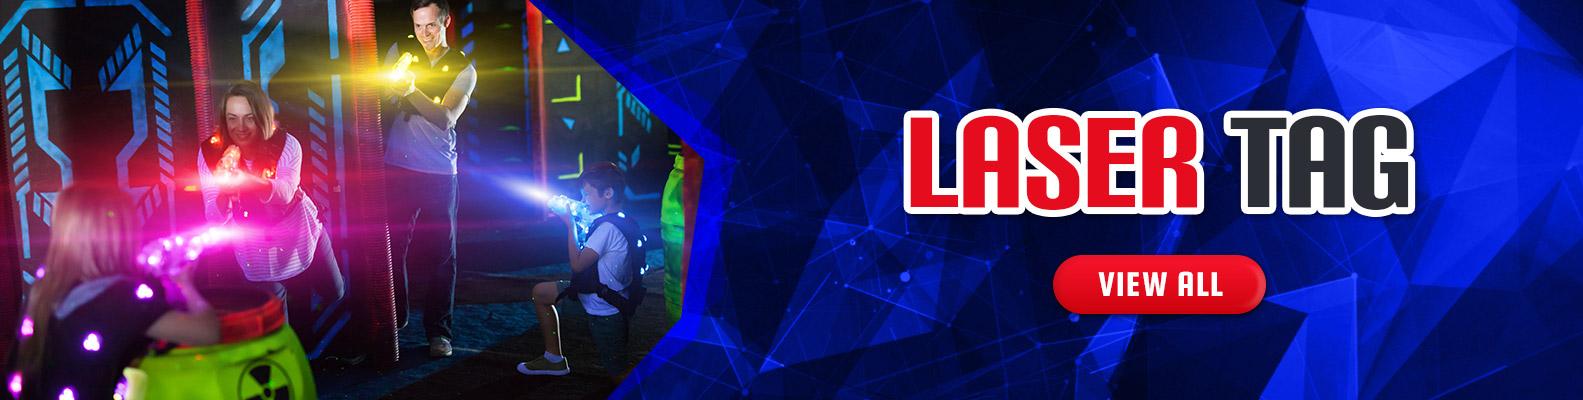 Worcester MA laser tag